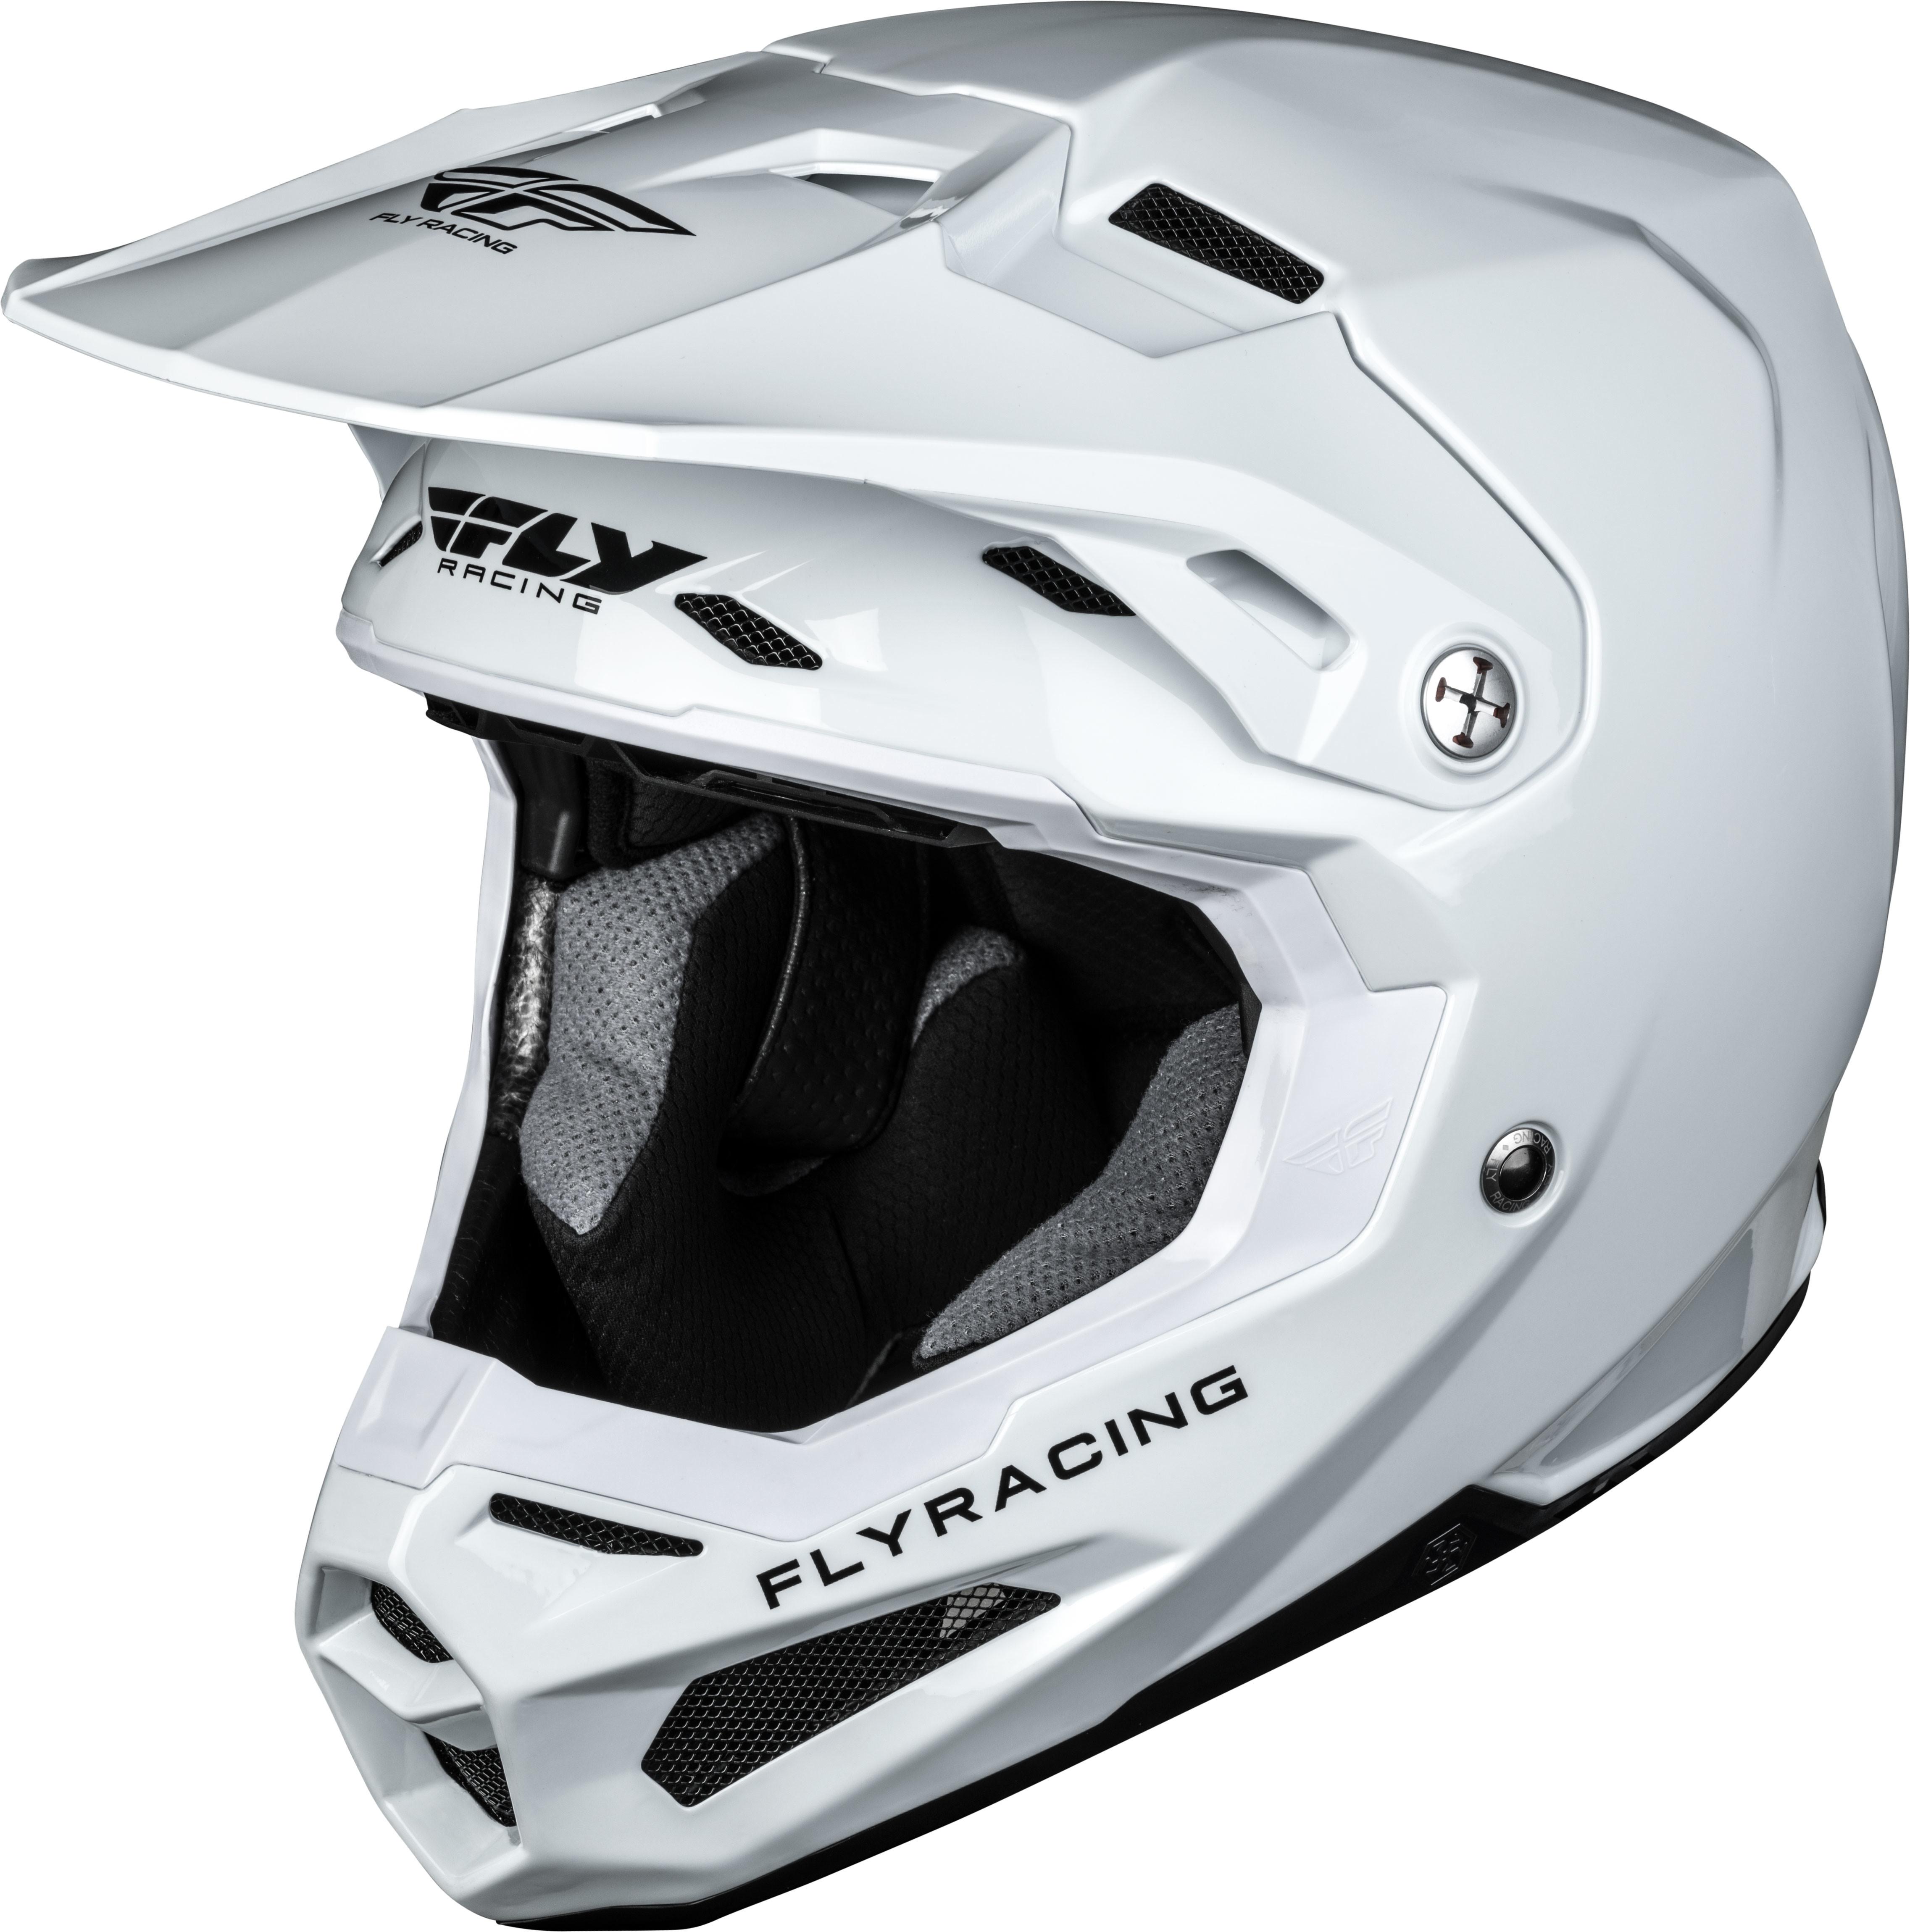 FORMULA SOLID Helmet White,  Xs  73-4401XS